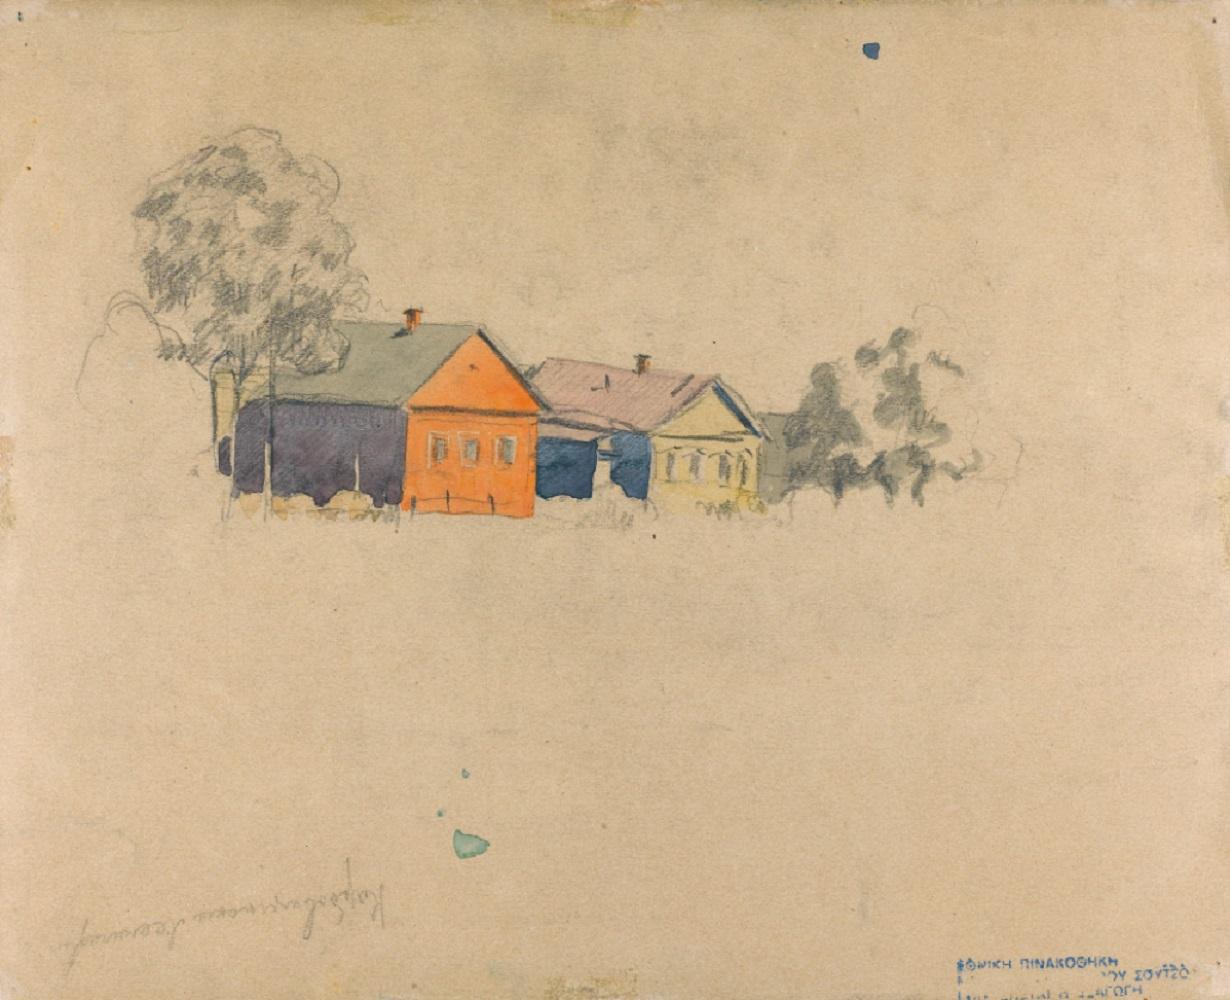 Ivan Kliun (Russian, 1873-1942), Village B. Gorki (the second village), 1929, watercolor - Image 2 of 2